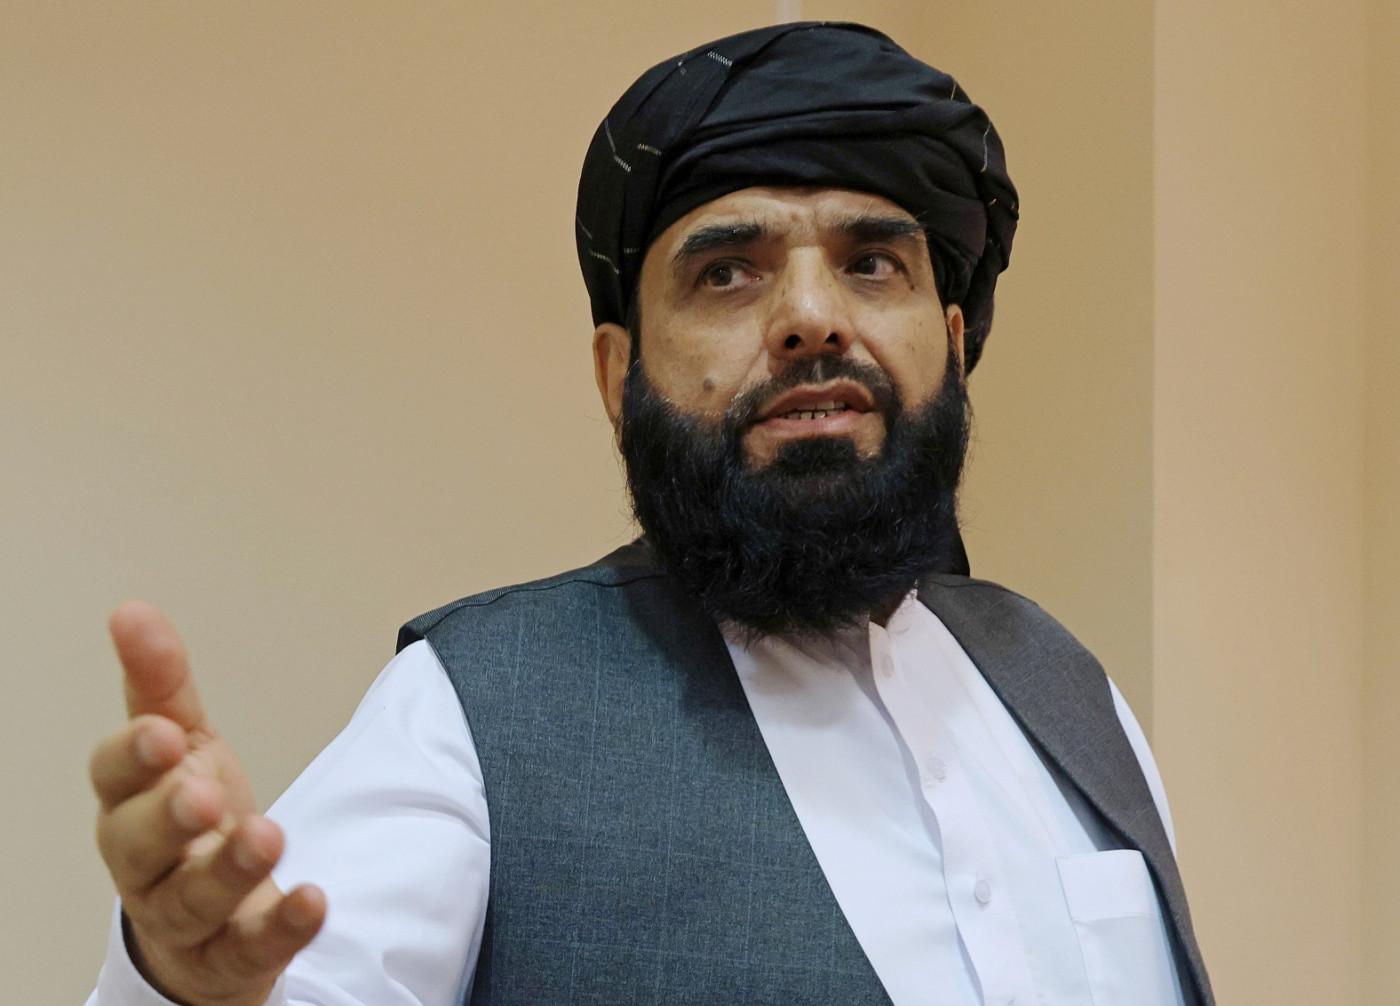 Suhail Shaheen, porta-voz do talibã